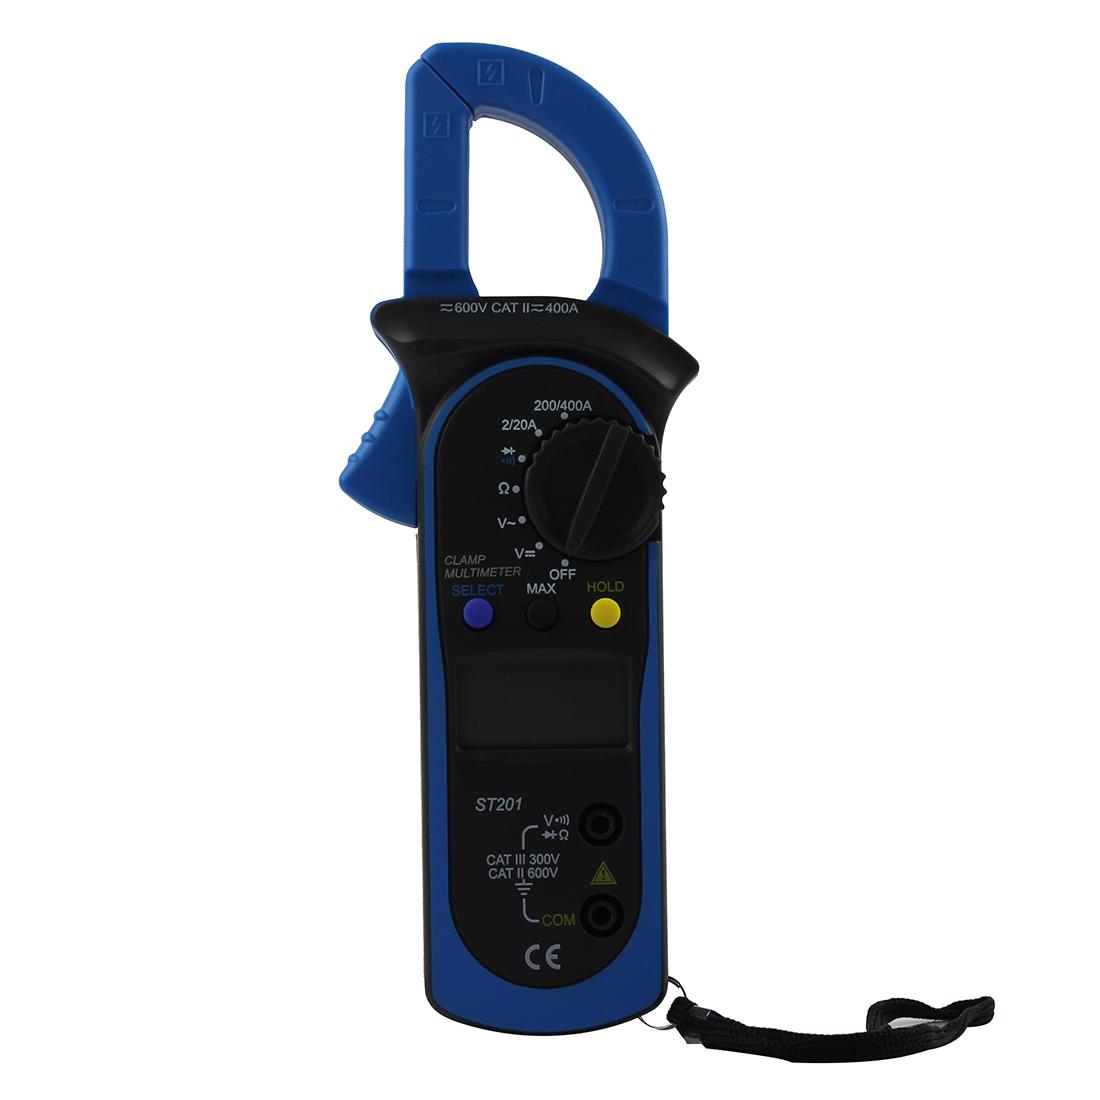 Amp Meter Clamp On : Digital clamp multimeter ohm amp meter ac dc current